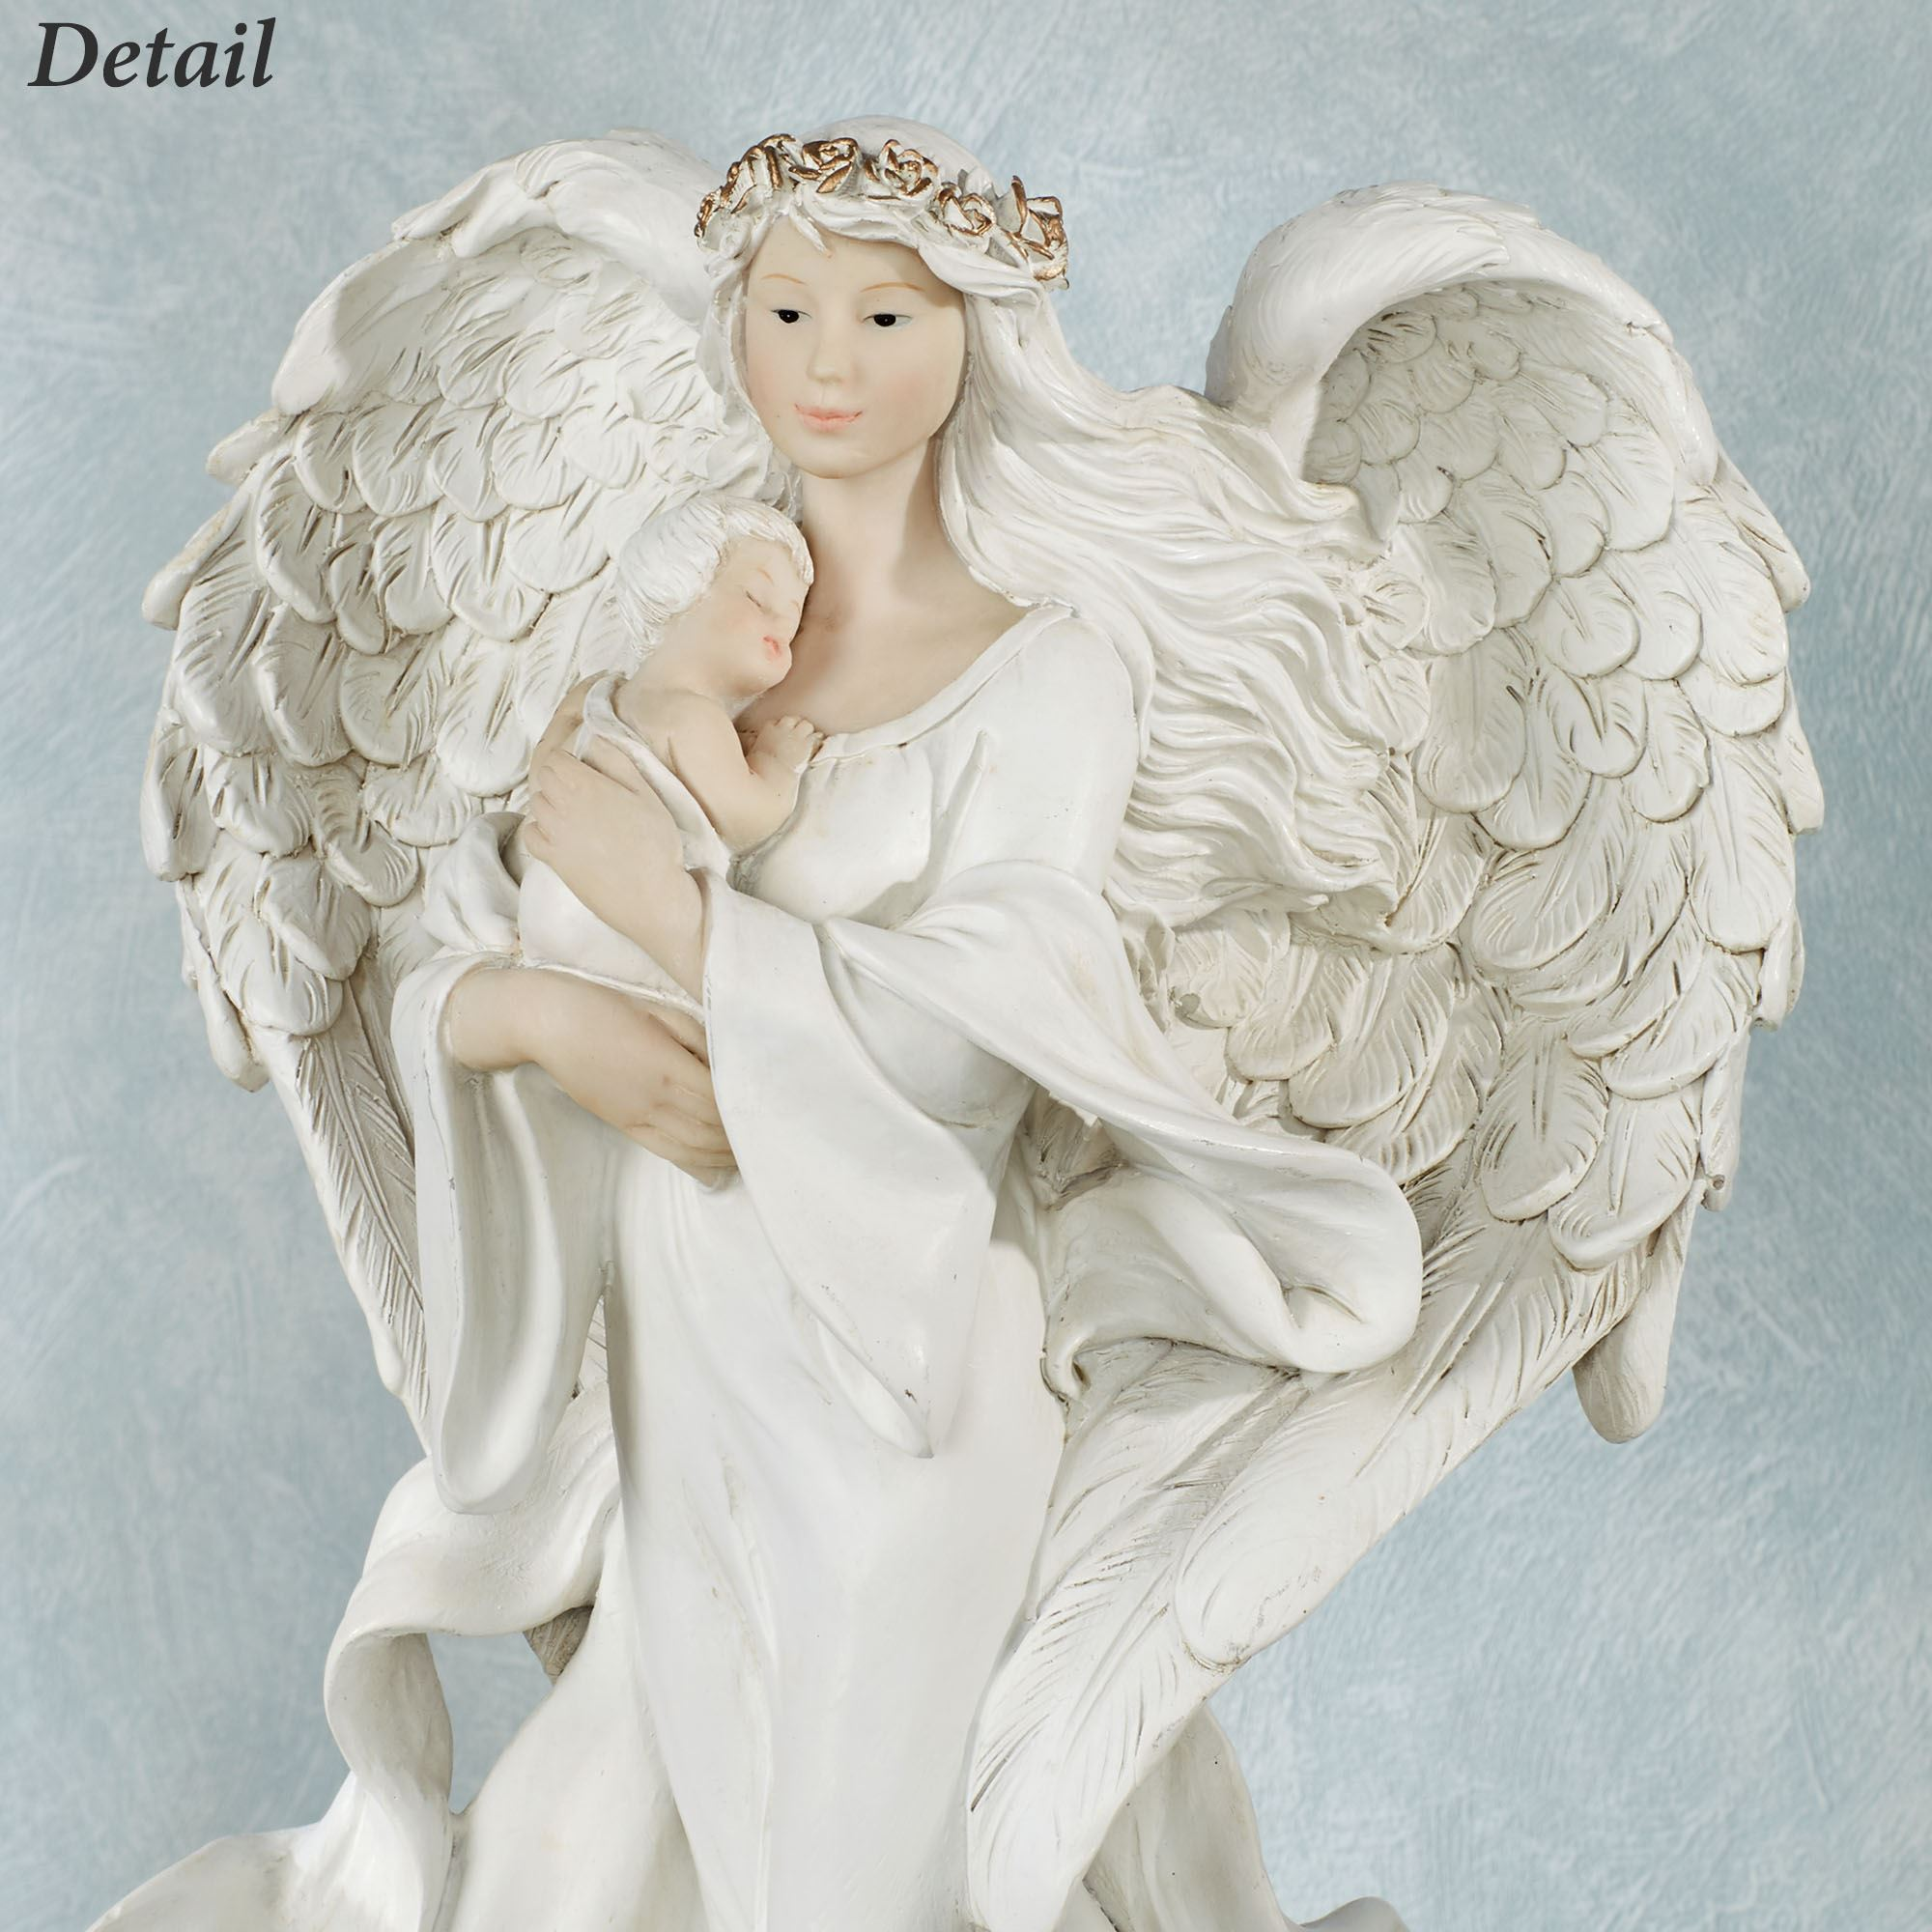 Undisturbed Love Angel With Baby Figurine